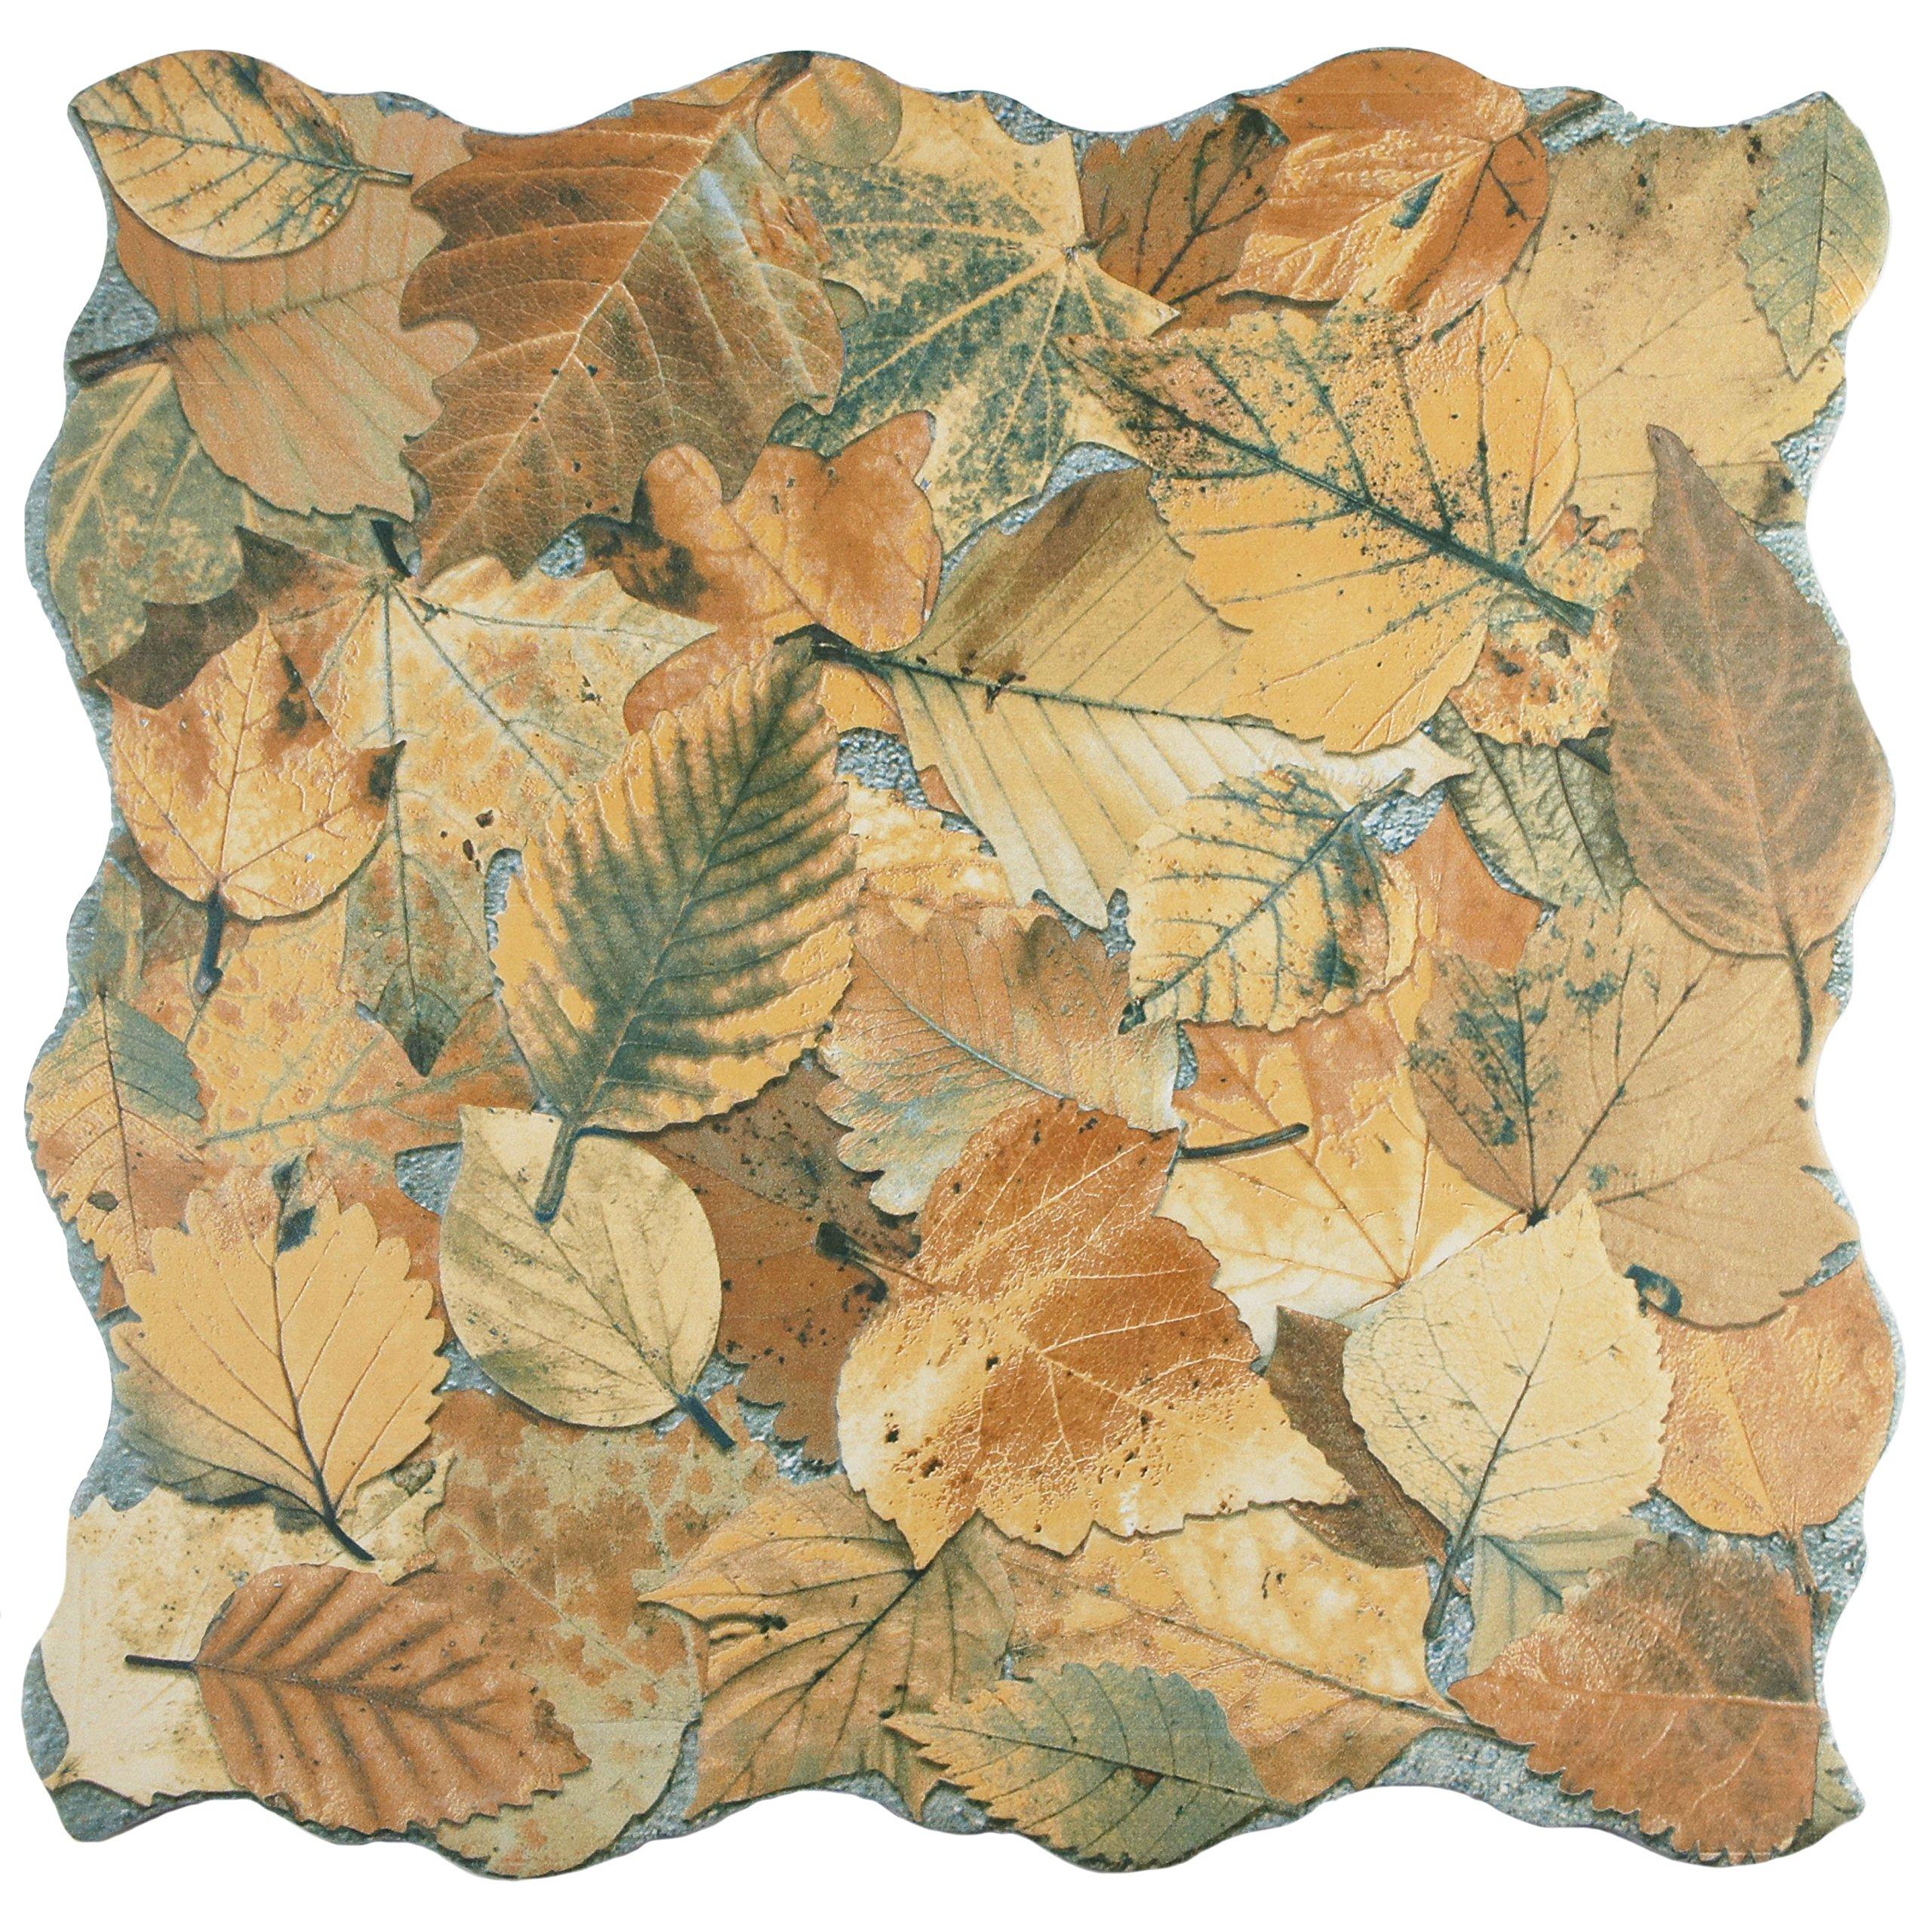 SomerTile FEM18OTO Autumno Porcelain Floor and Wall Tile, 17.75'' x 17.75'', Brown/Beige/Grey/Green